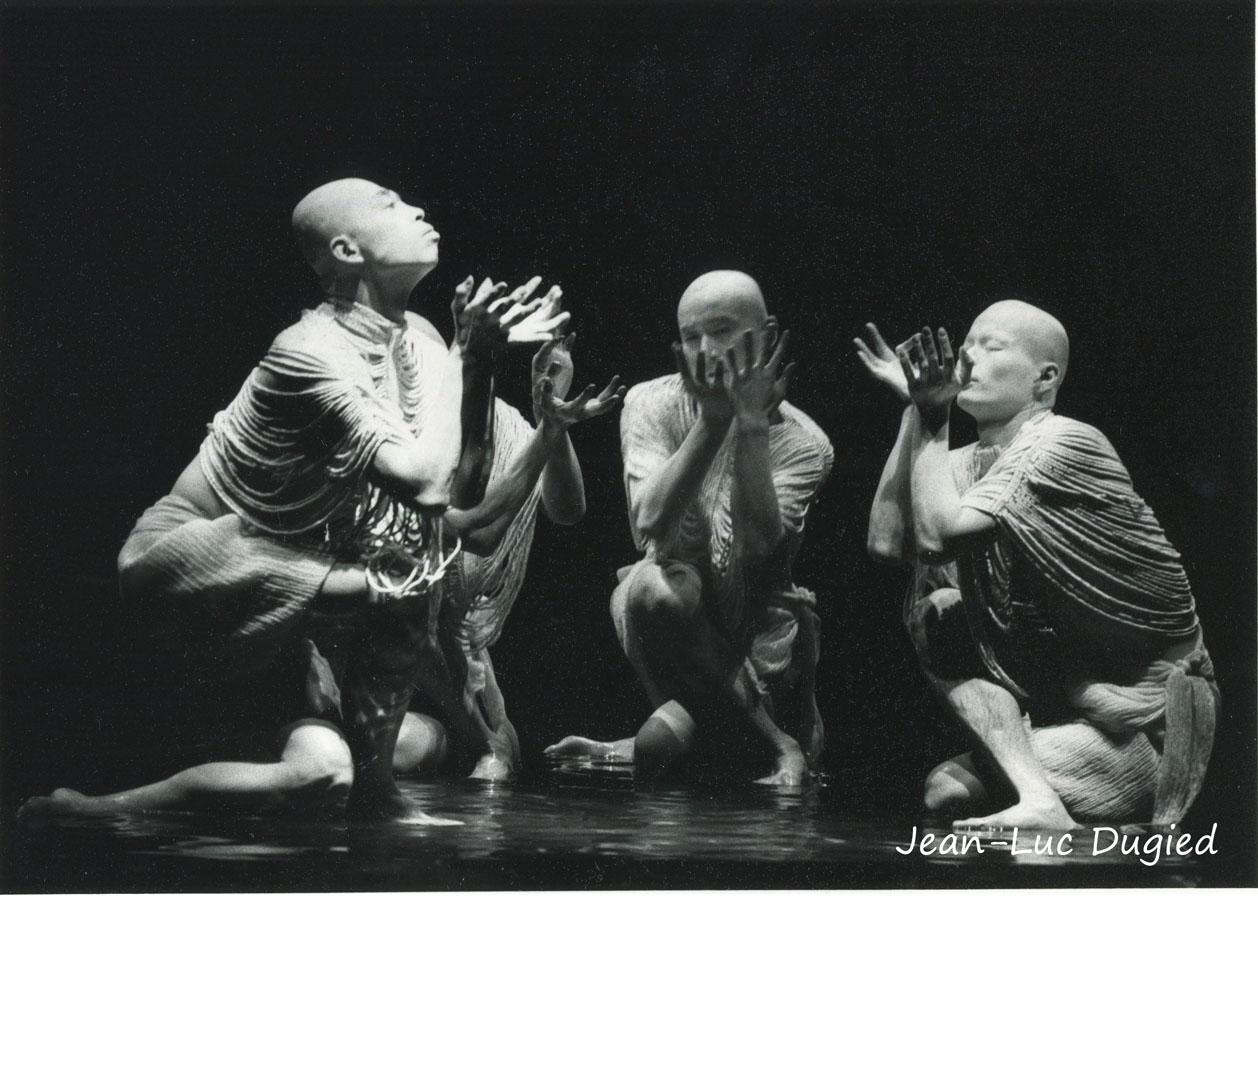 30 Sankai Juku - Unetsu (des oeufs debout par curiosité) - chor. Ushio Amagatsu - 1986